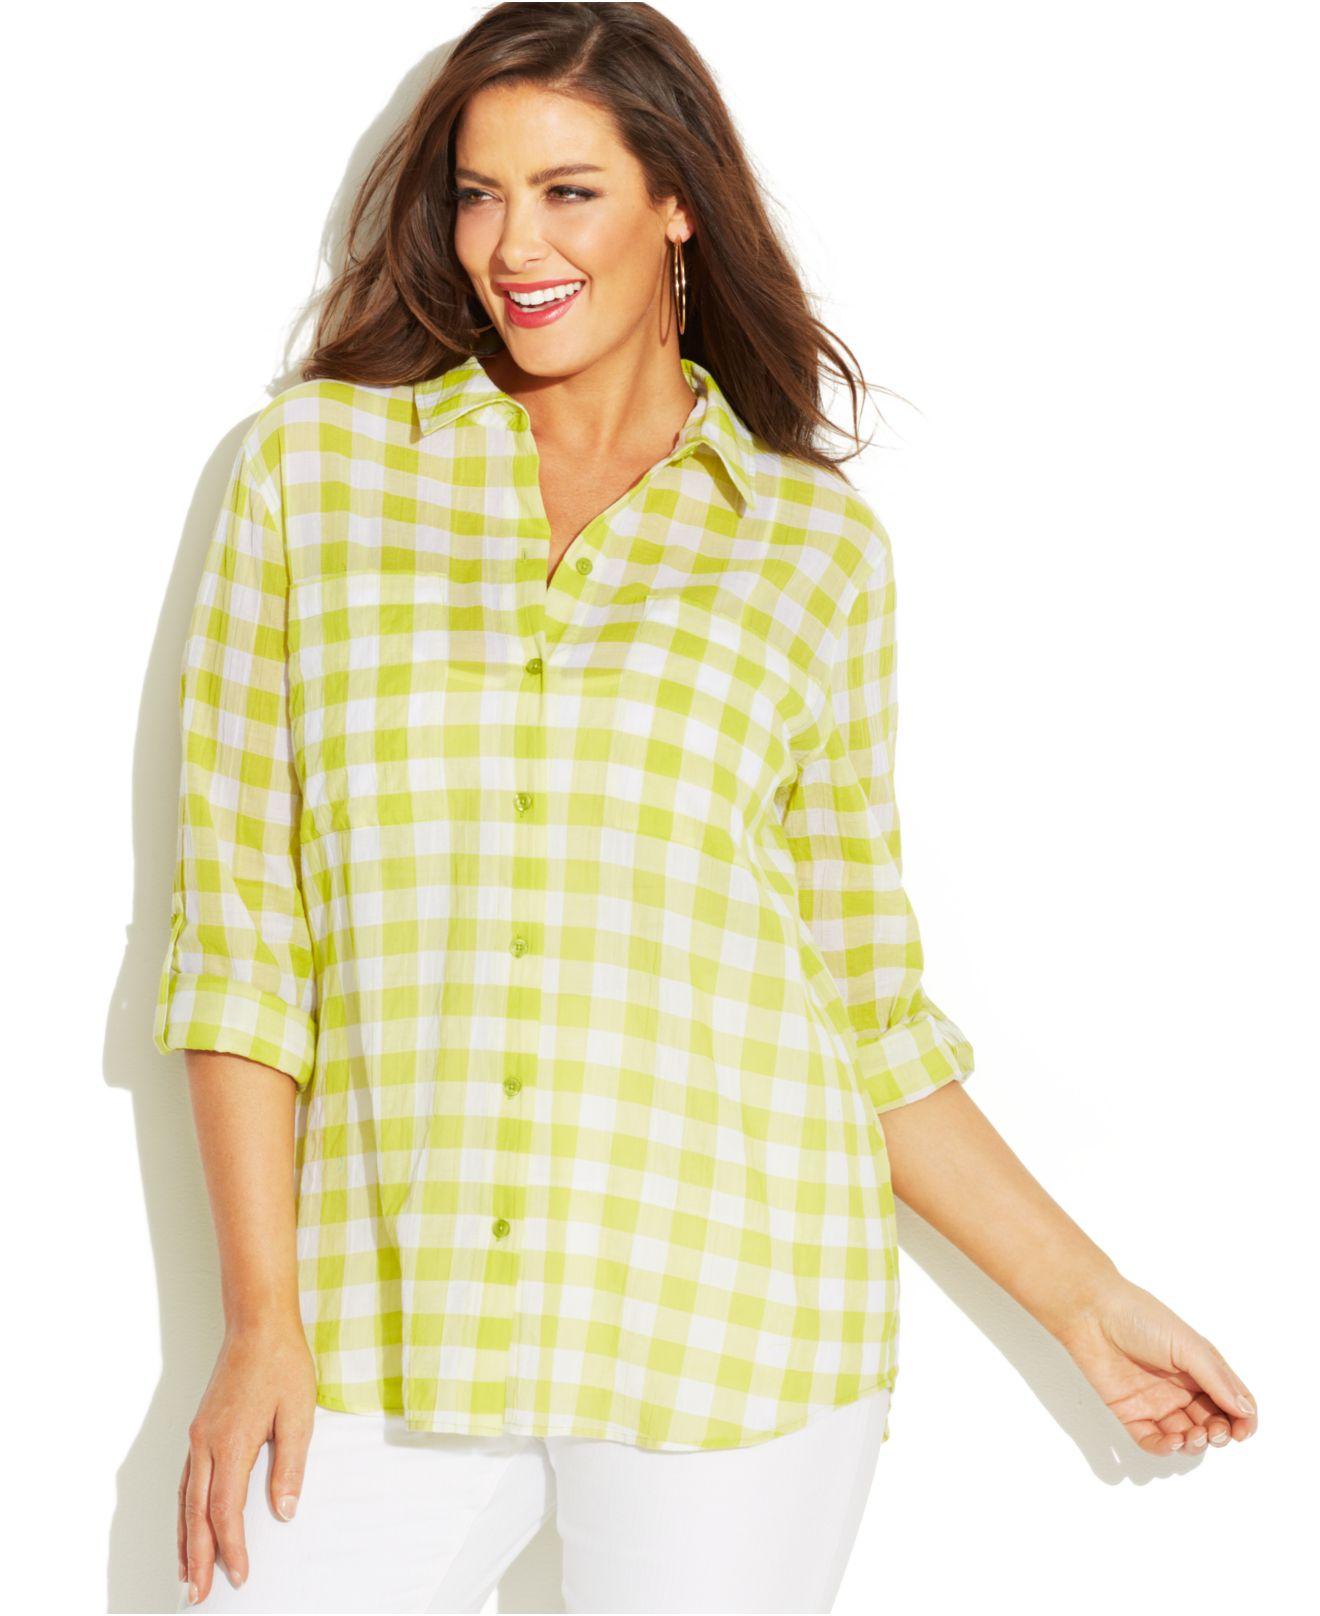 02046b2e176 Lyst - Michael Kors Michael Plus Size Tab-Sleeve Gingham Shirt in Green